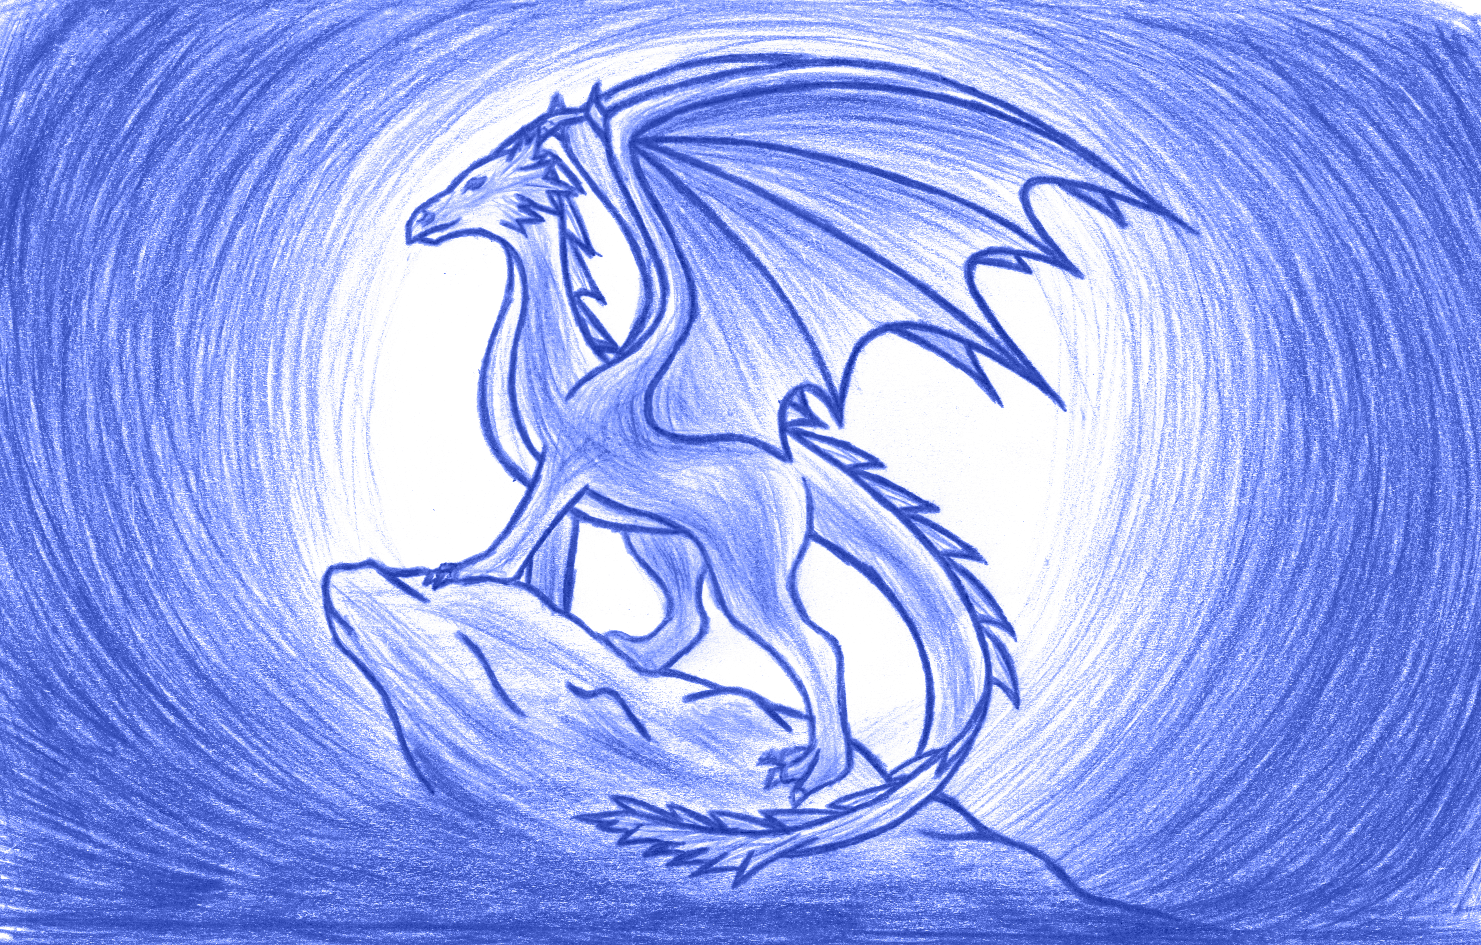 Dragon on a stone